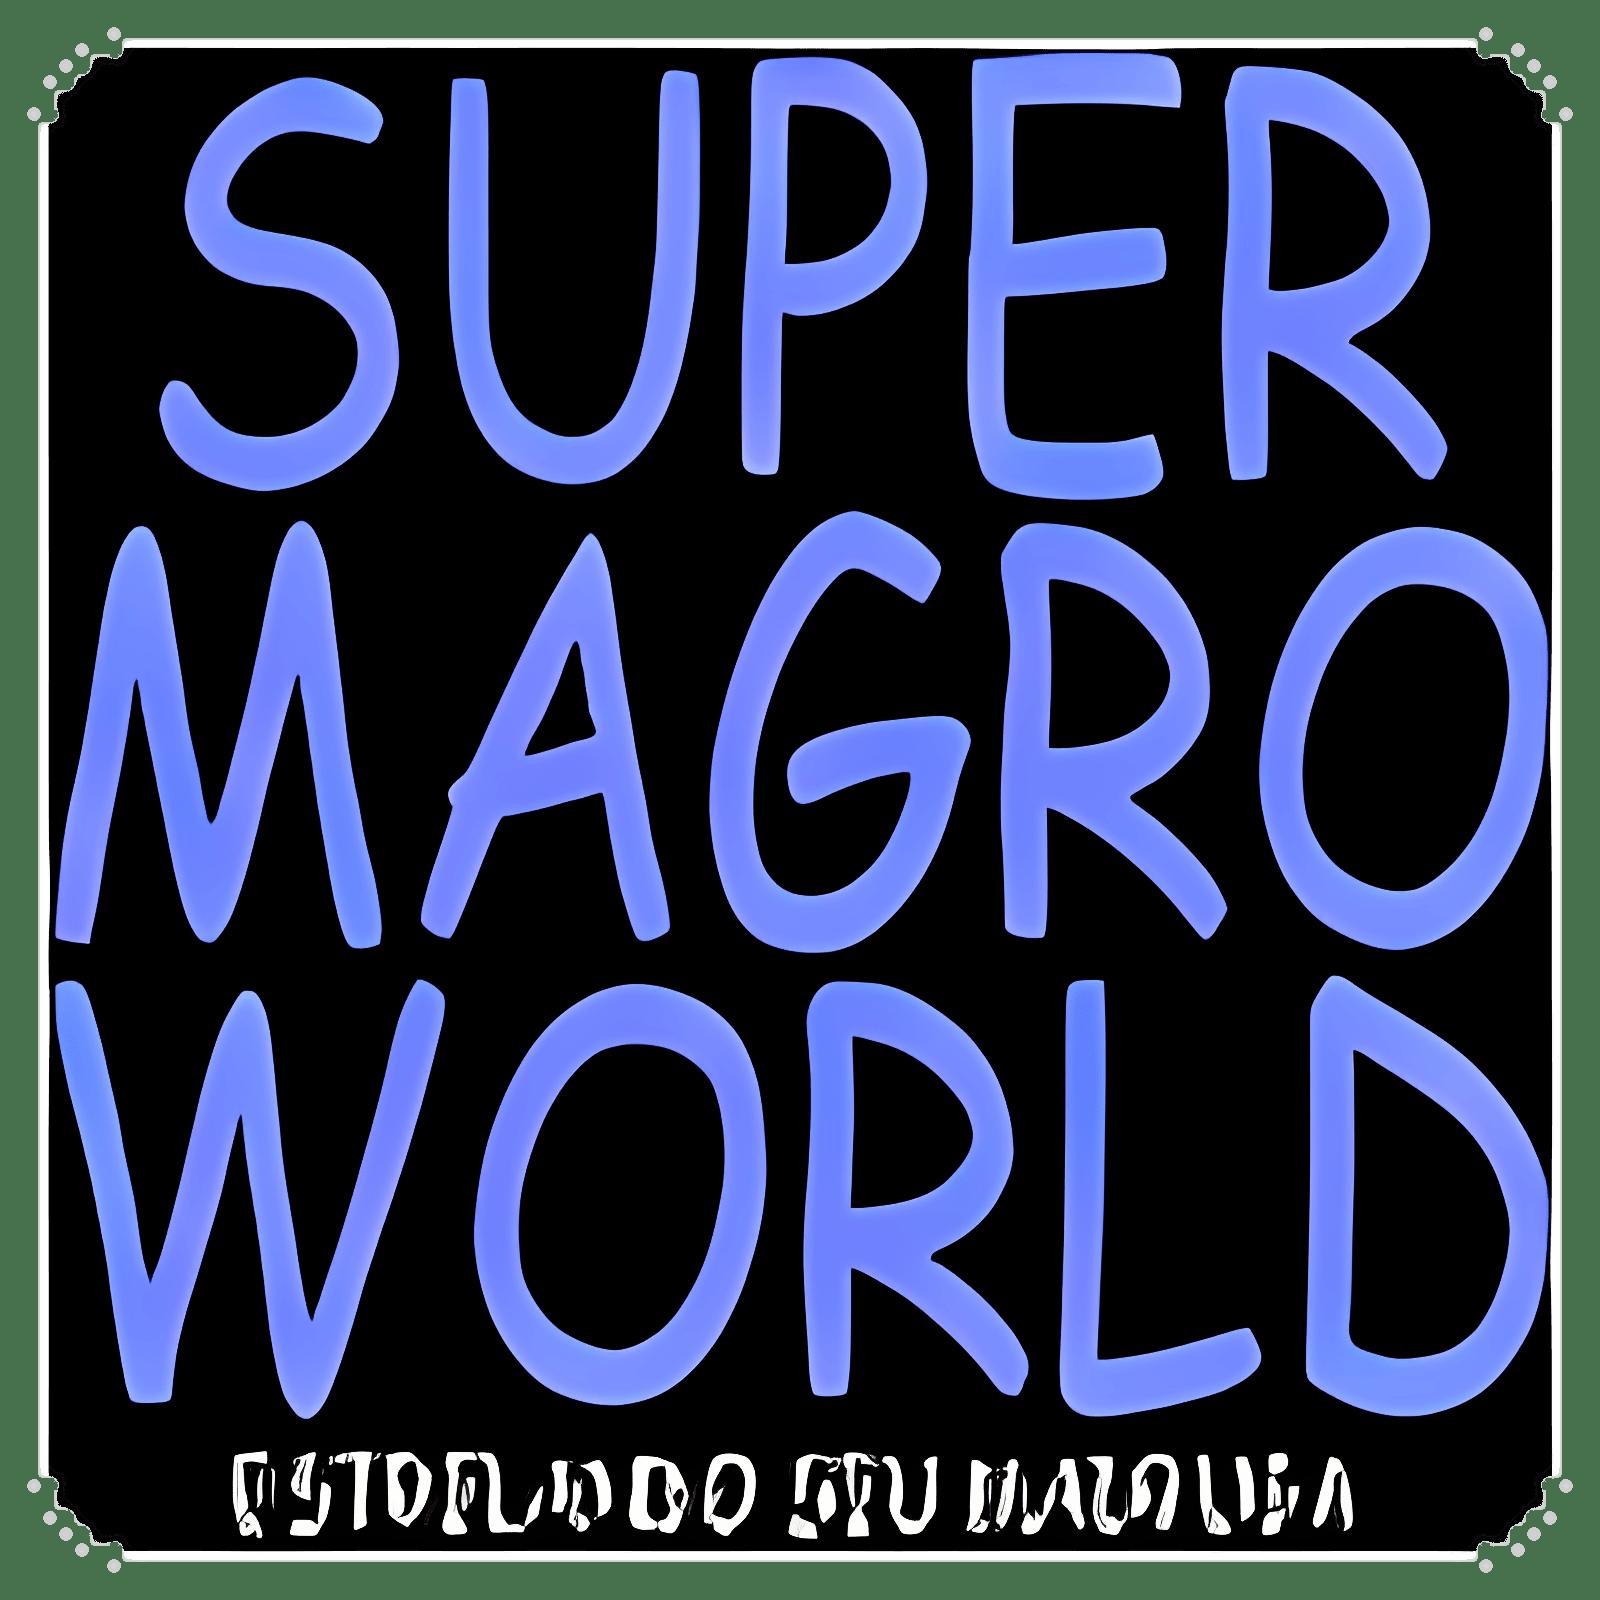 Super Magro World